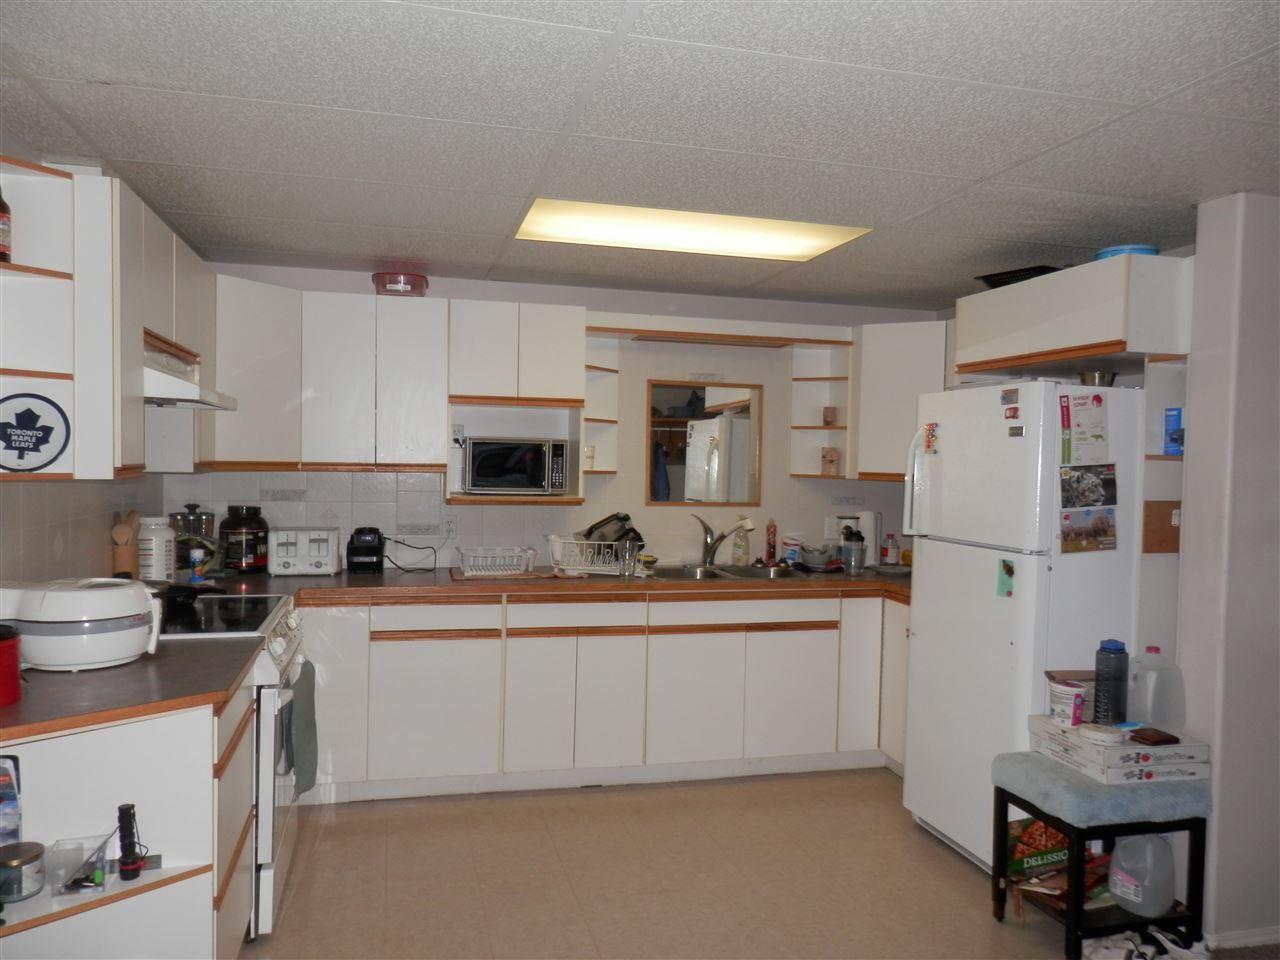 Photo 12: Photos: 935 HODGSON Road in Williams Lake: Esler/Dog Creek House for sale (Williams Lake (Zone 27))  : MLS®# R2414109